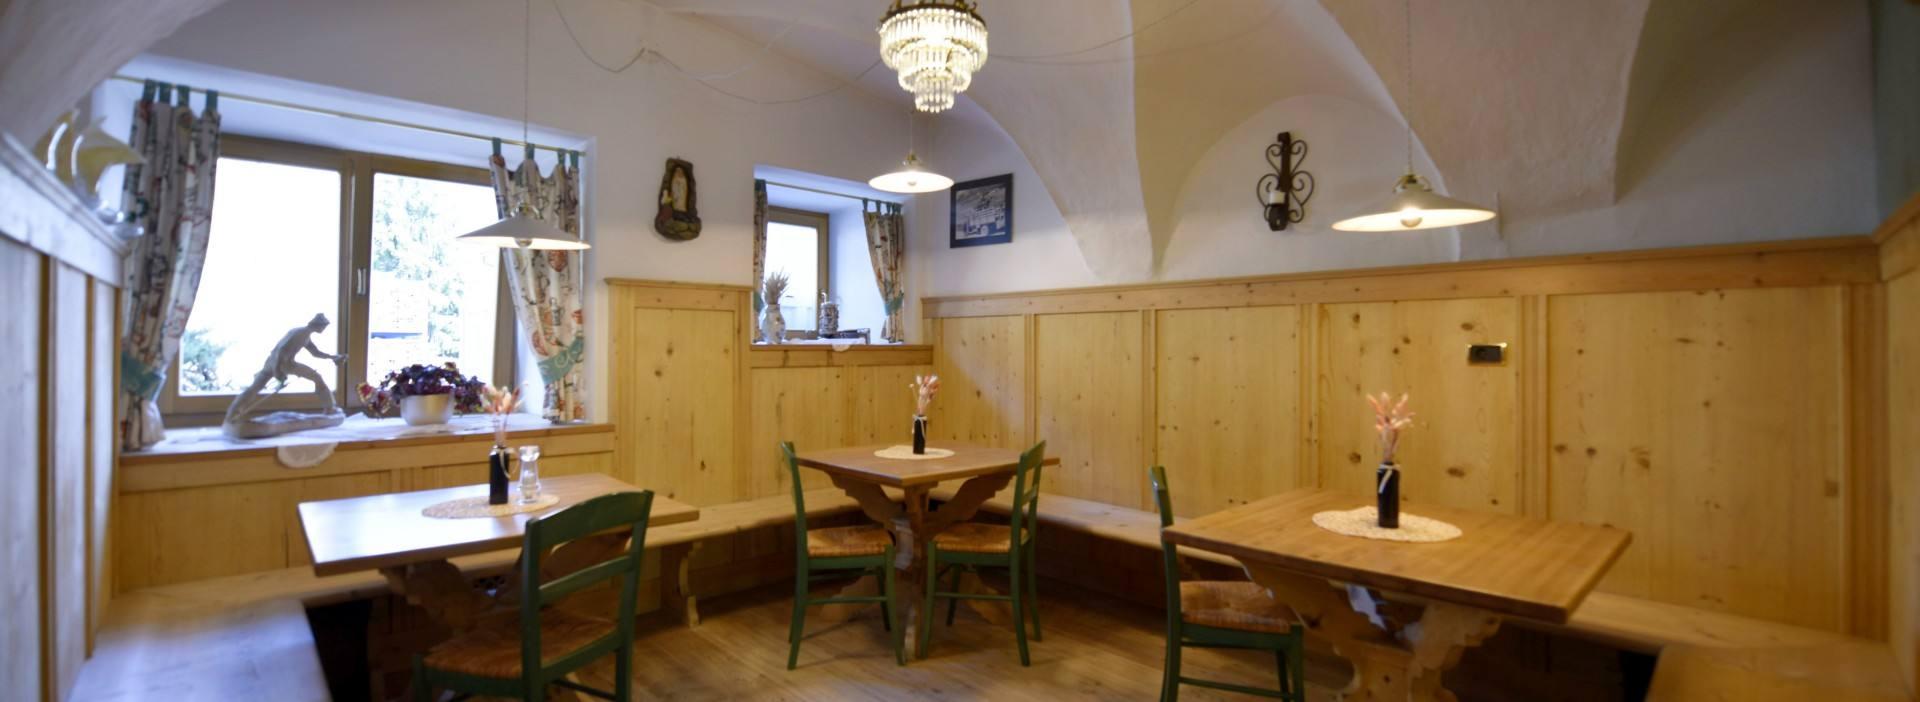 Restaurant Alp Cron Moarhof